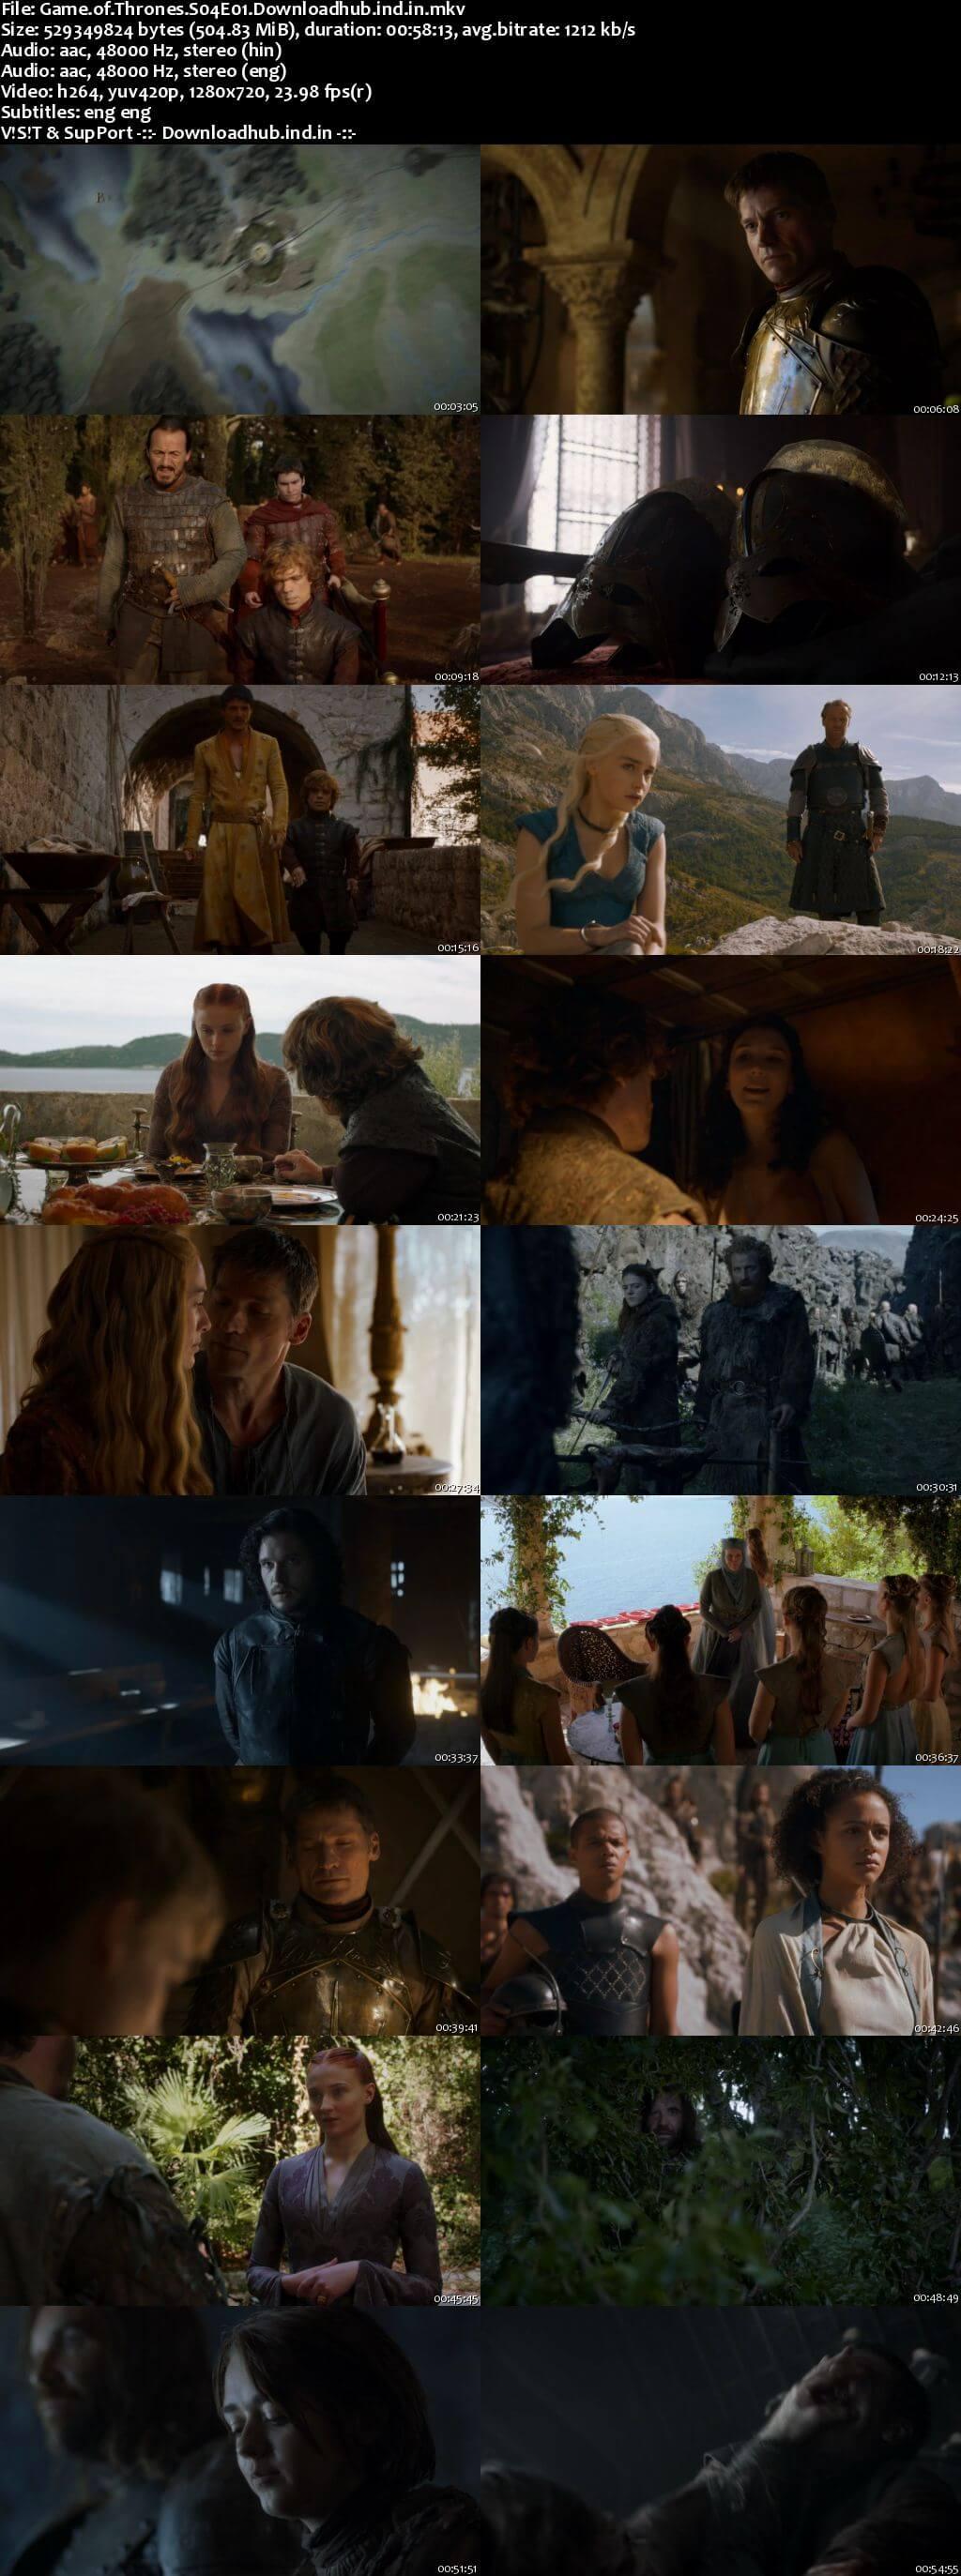 Game of Thrones S04 Complete Hindi Dual Audio 720p BRRip ESubs